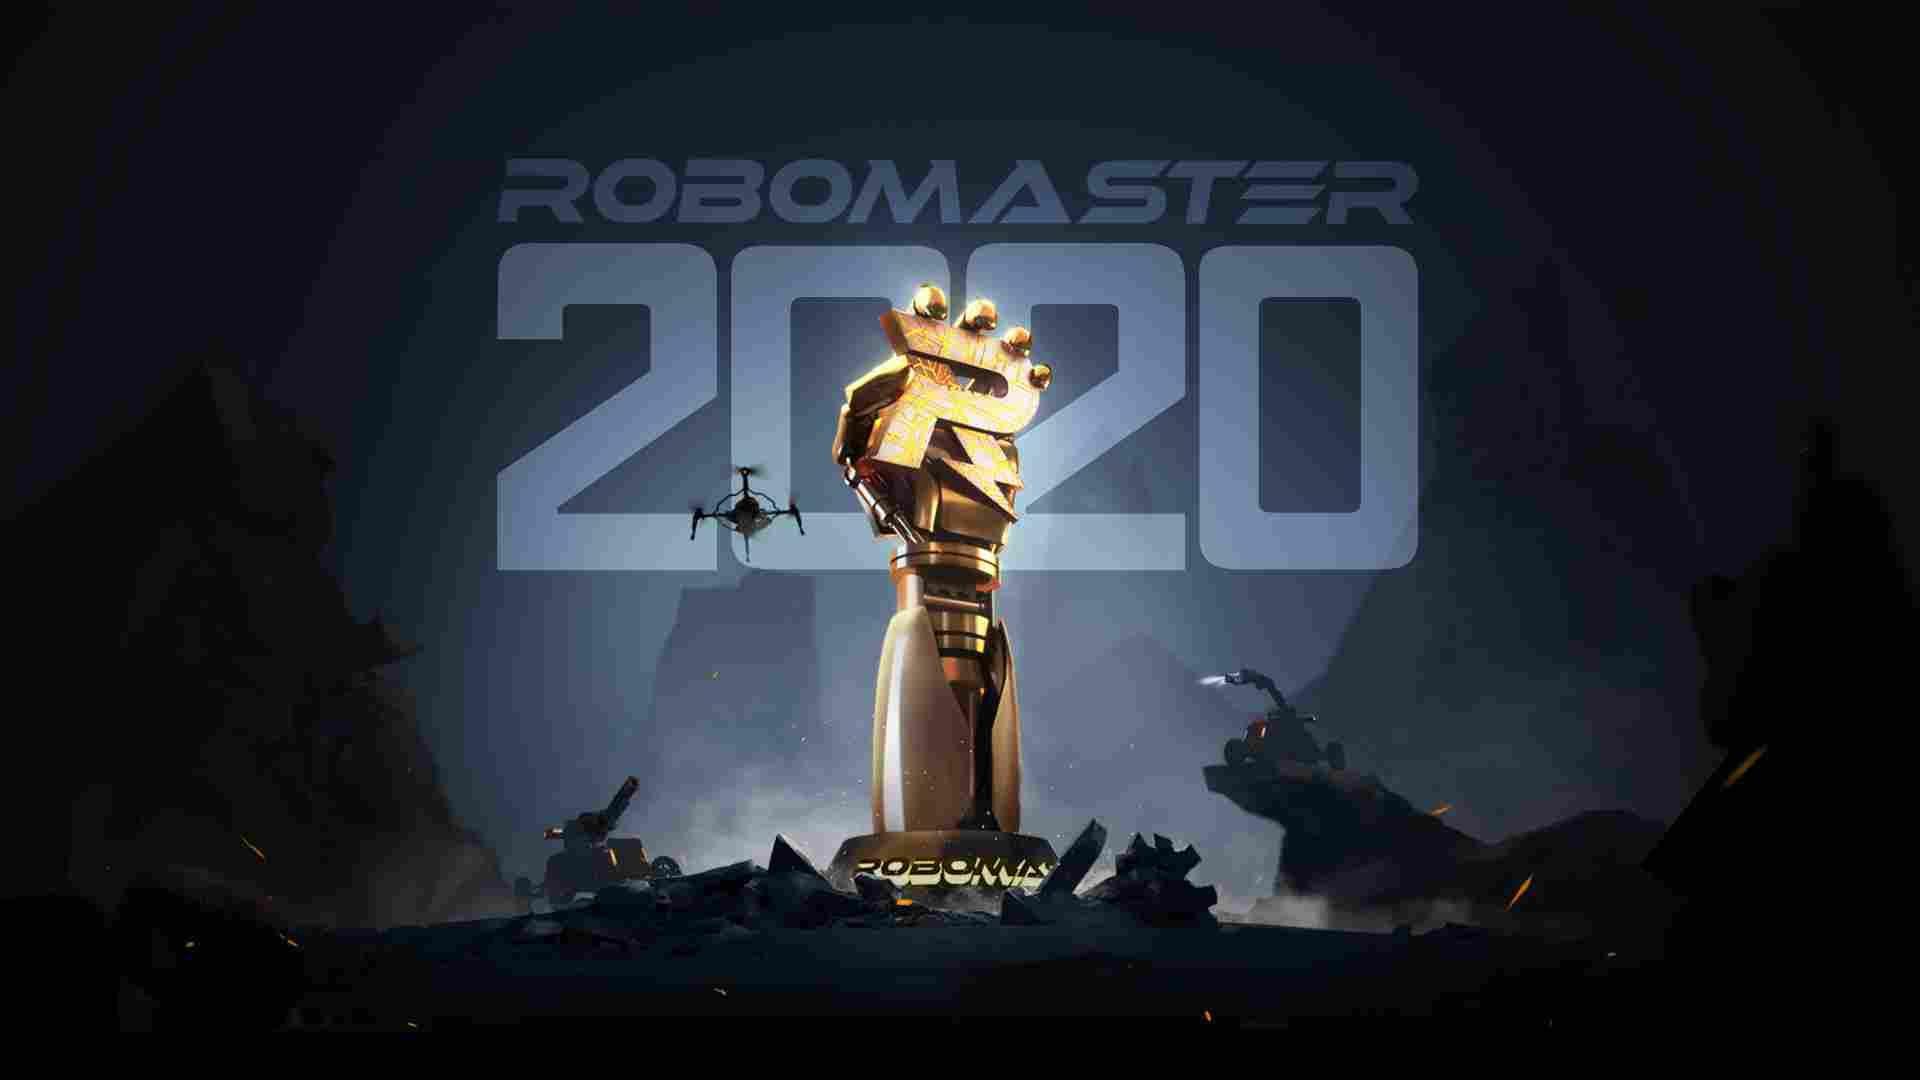 RoboMaster 2020机甲大师对抗赛飞手理论测评通过名单